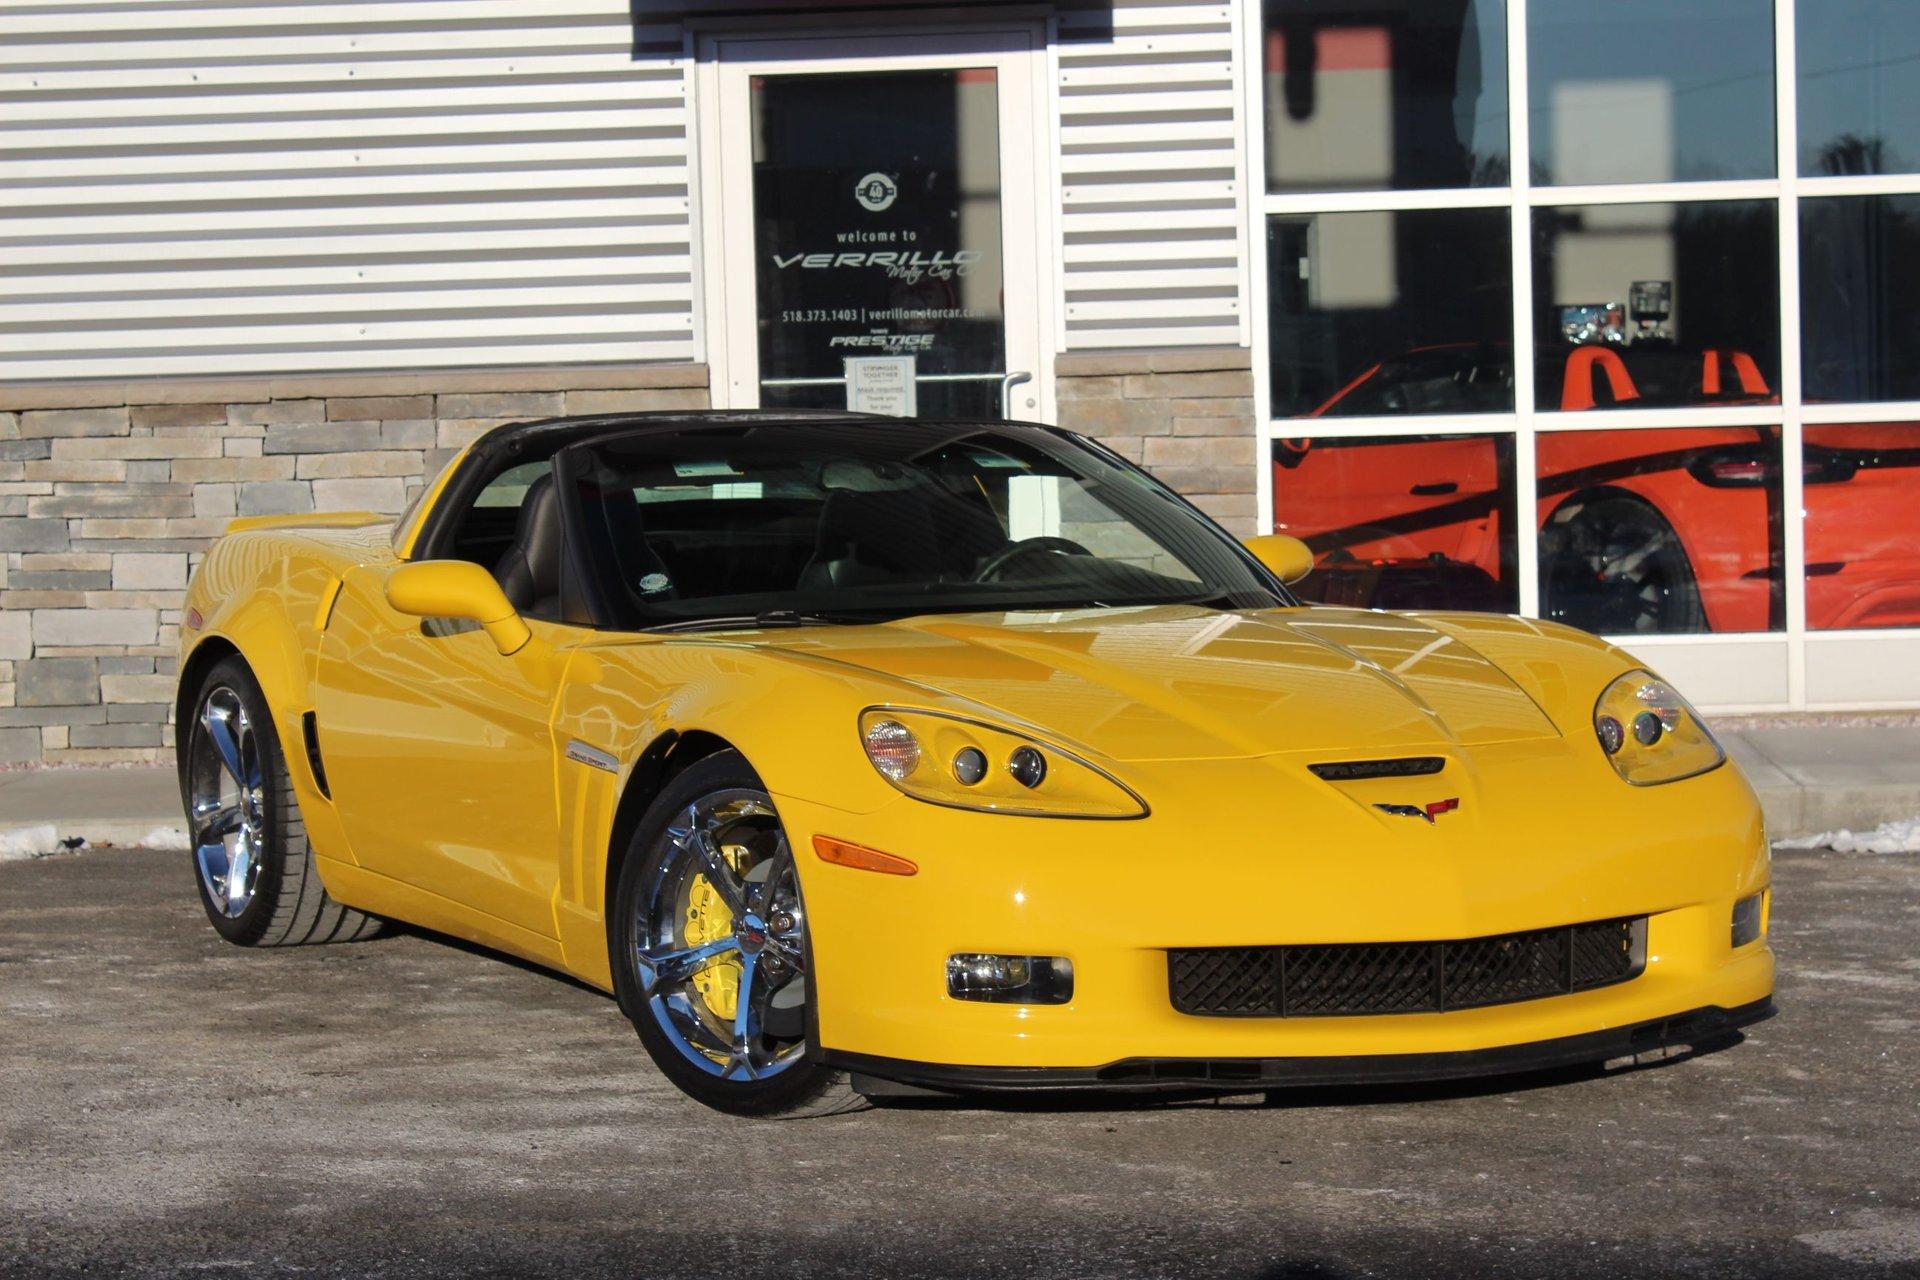 2010 chevrolet corvette grand sport coupe w 3lt